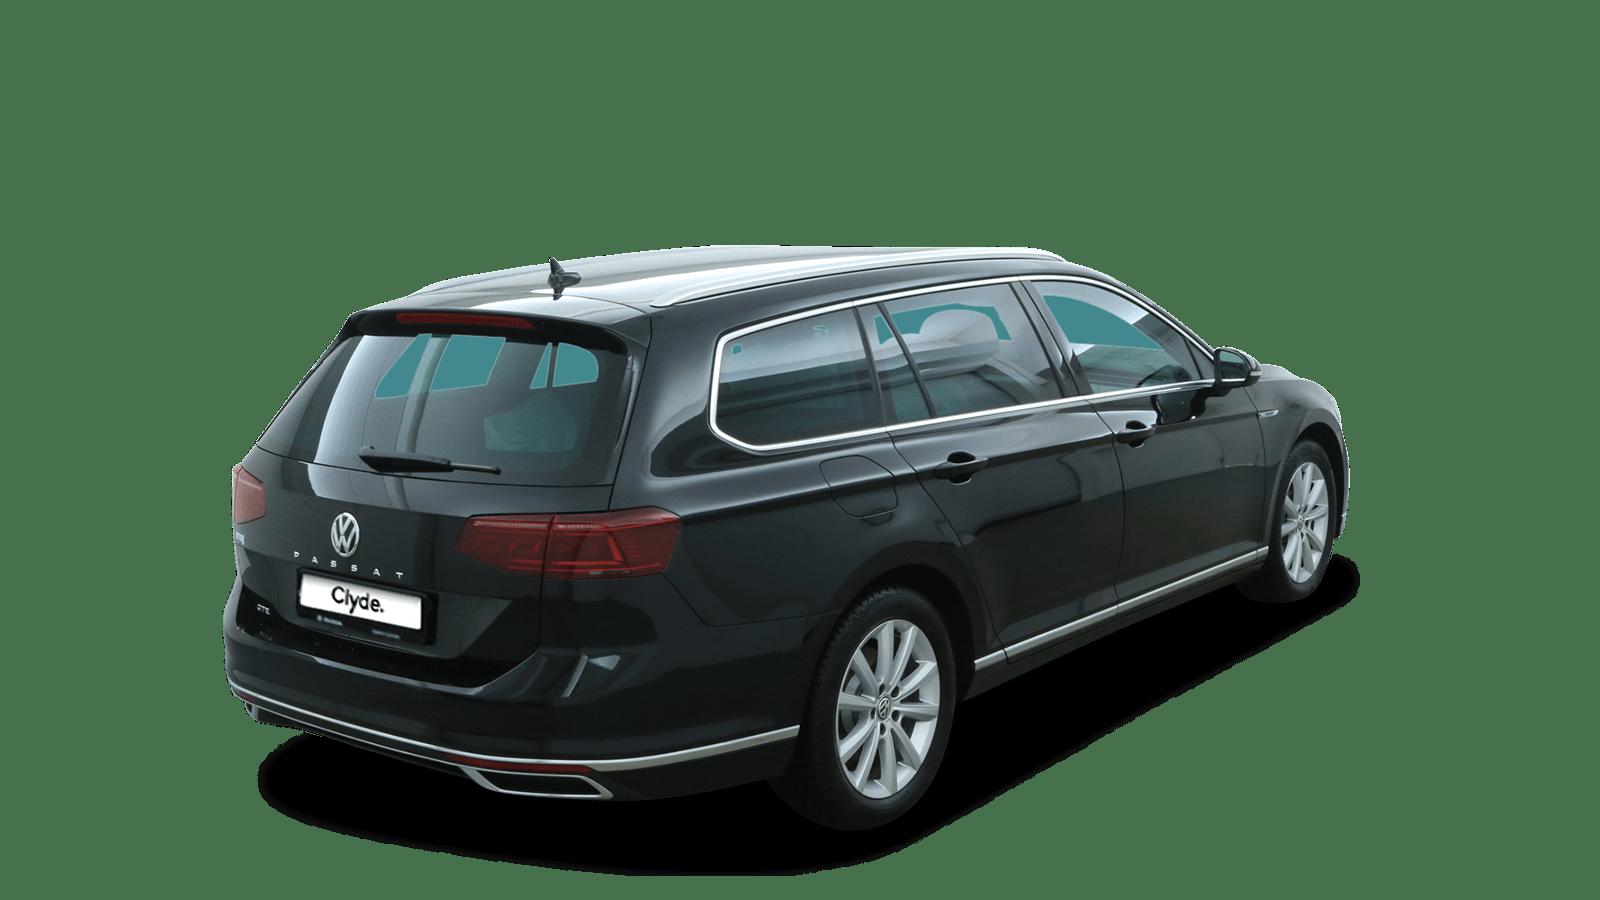 VW Passat Variant Black back - Clyde car subscription